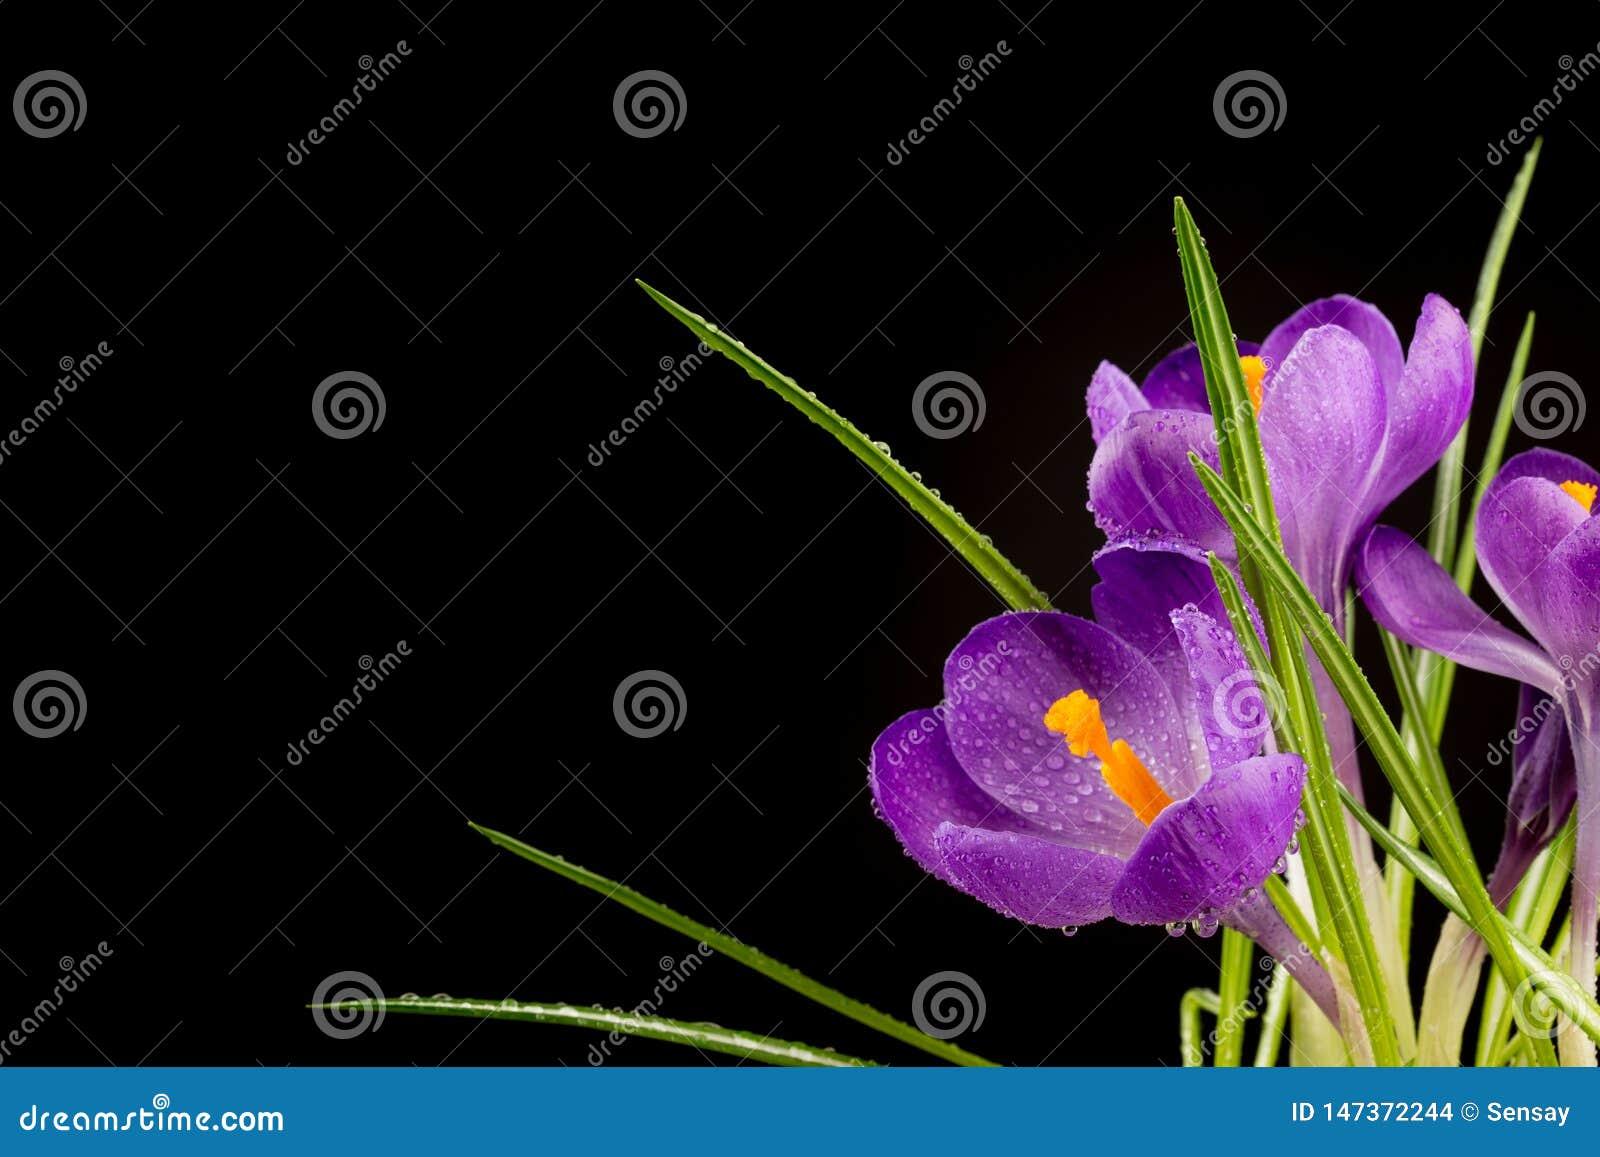 Macro view of a beautiful crocus flower on black. Spring background